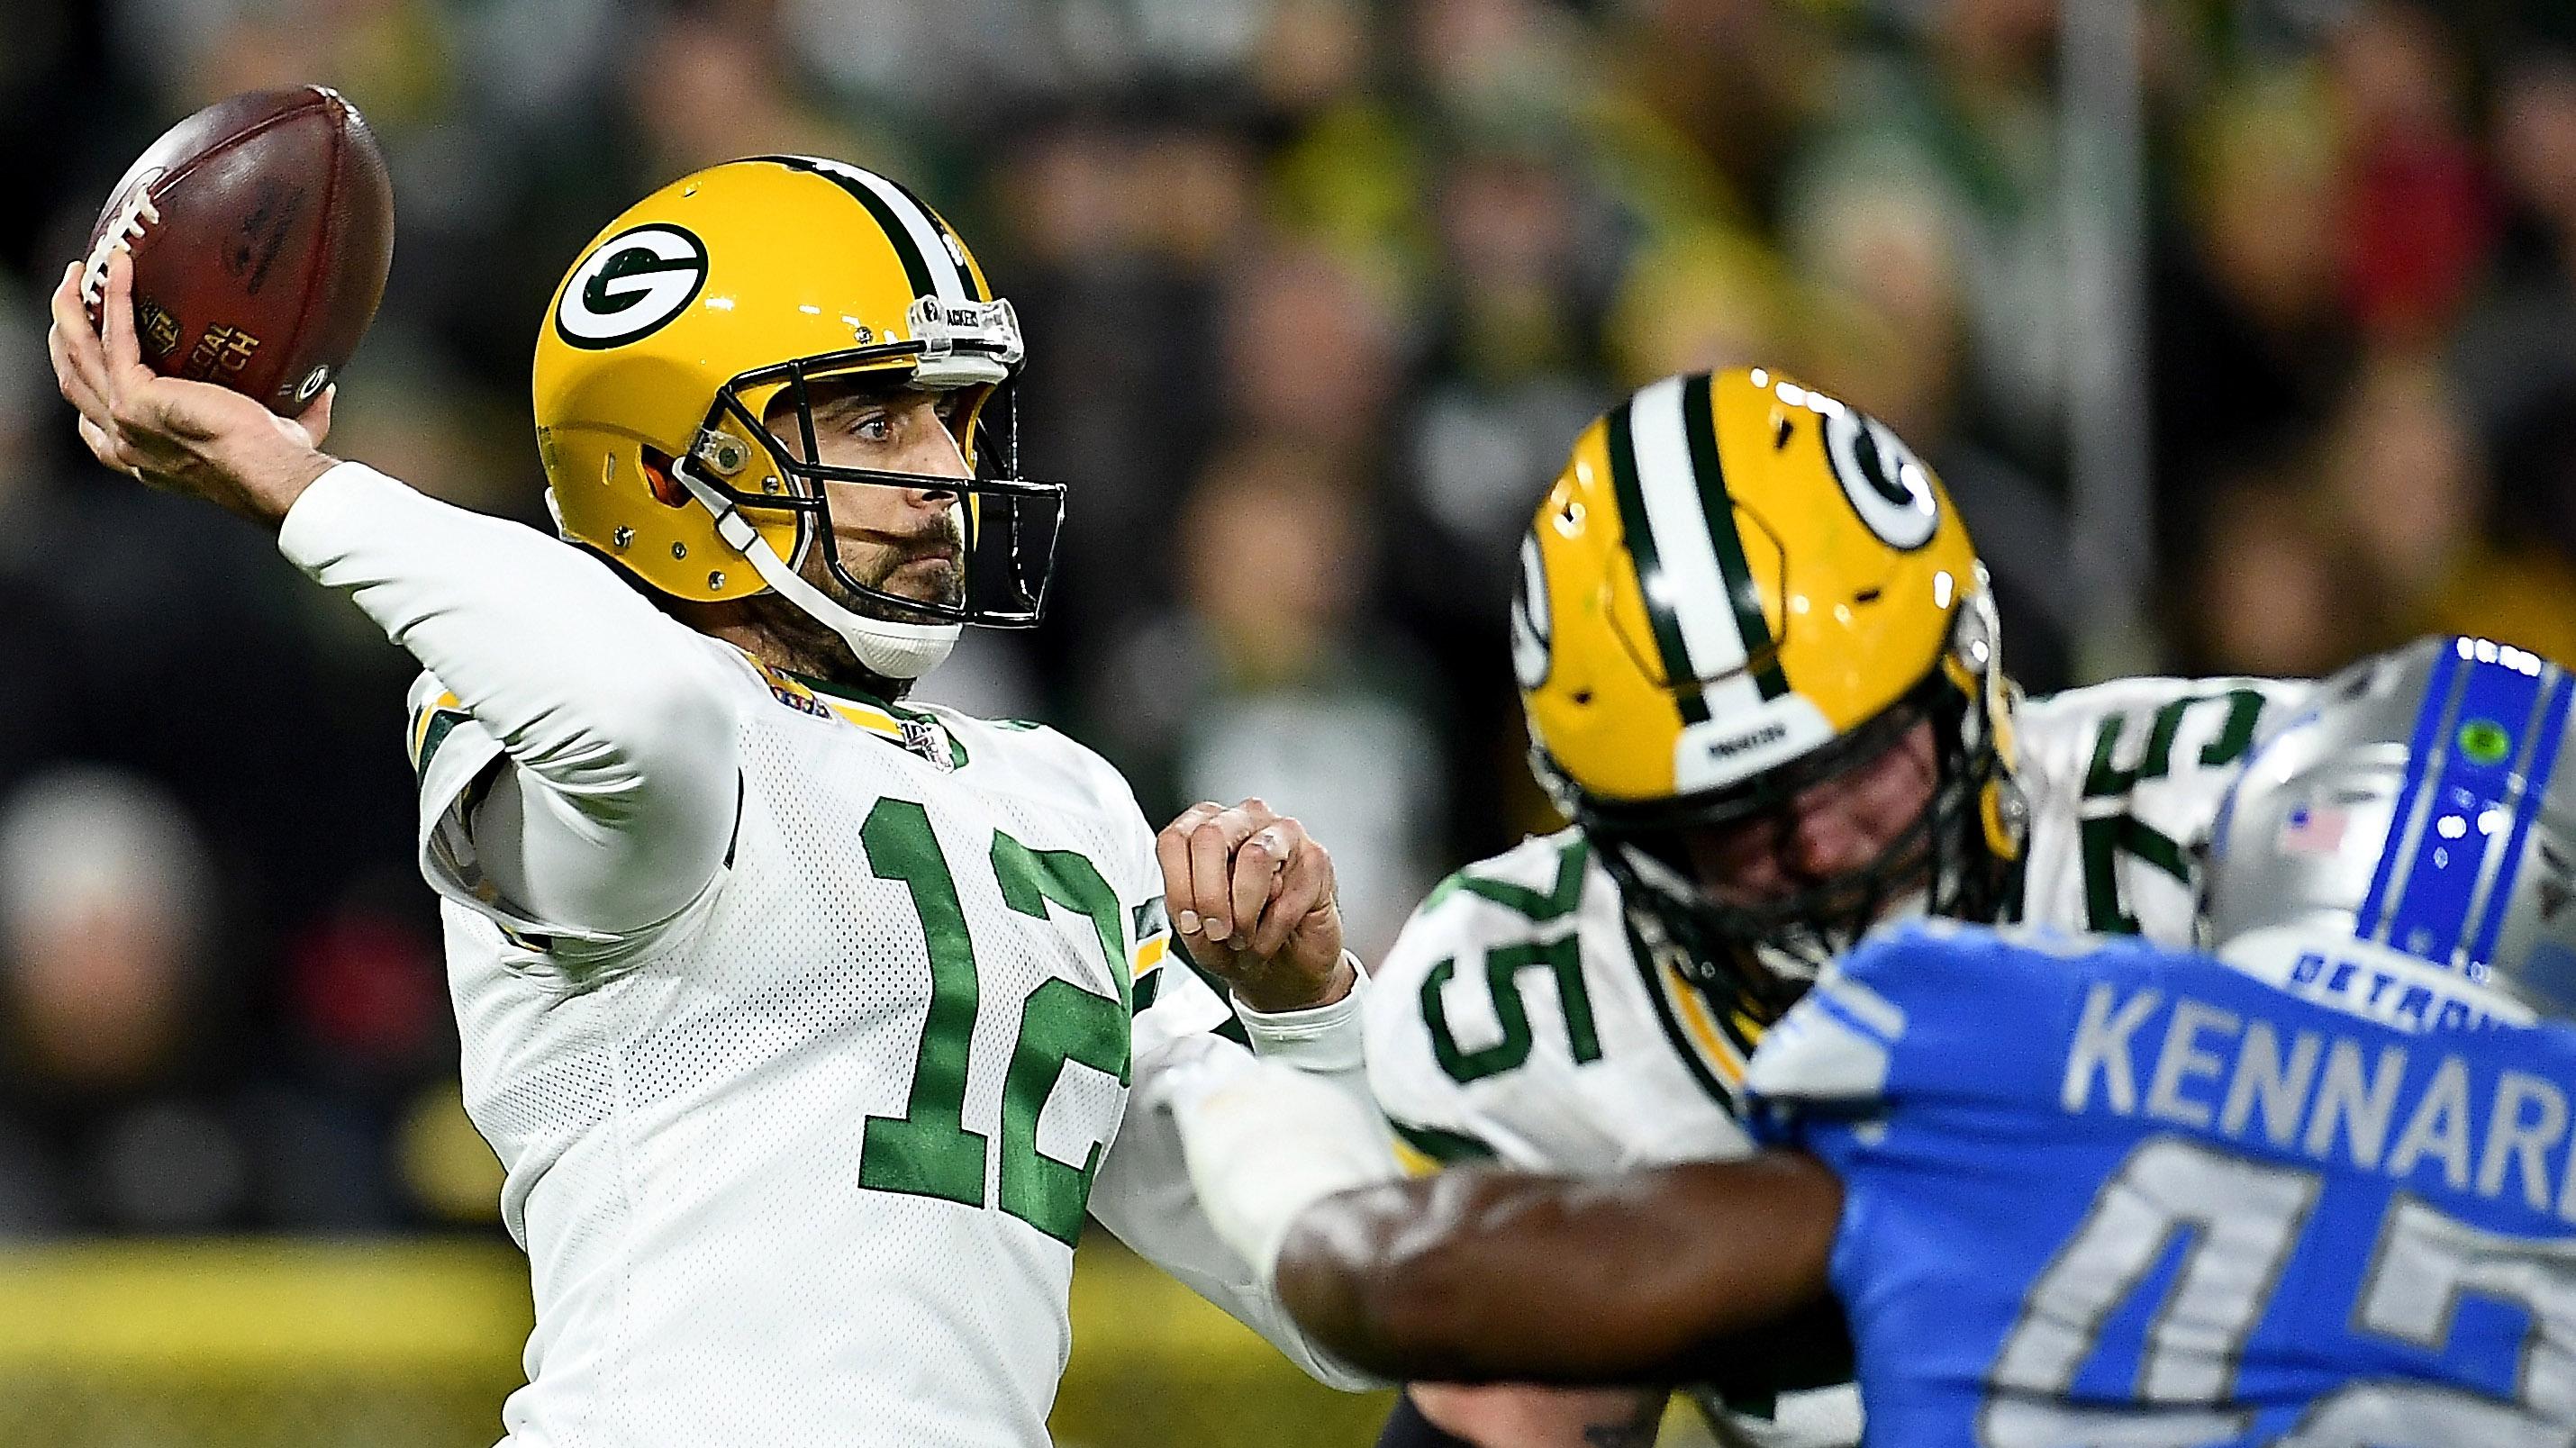 Oakland Raiders vs. Green Bay Packers Week 7 preview